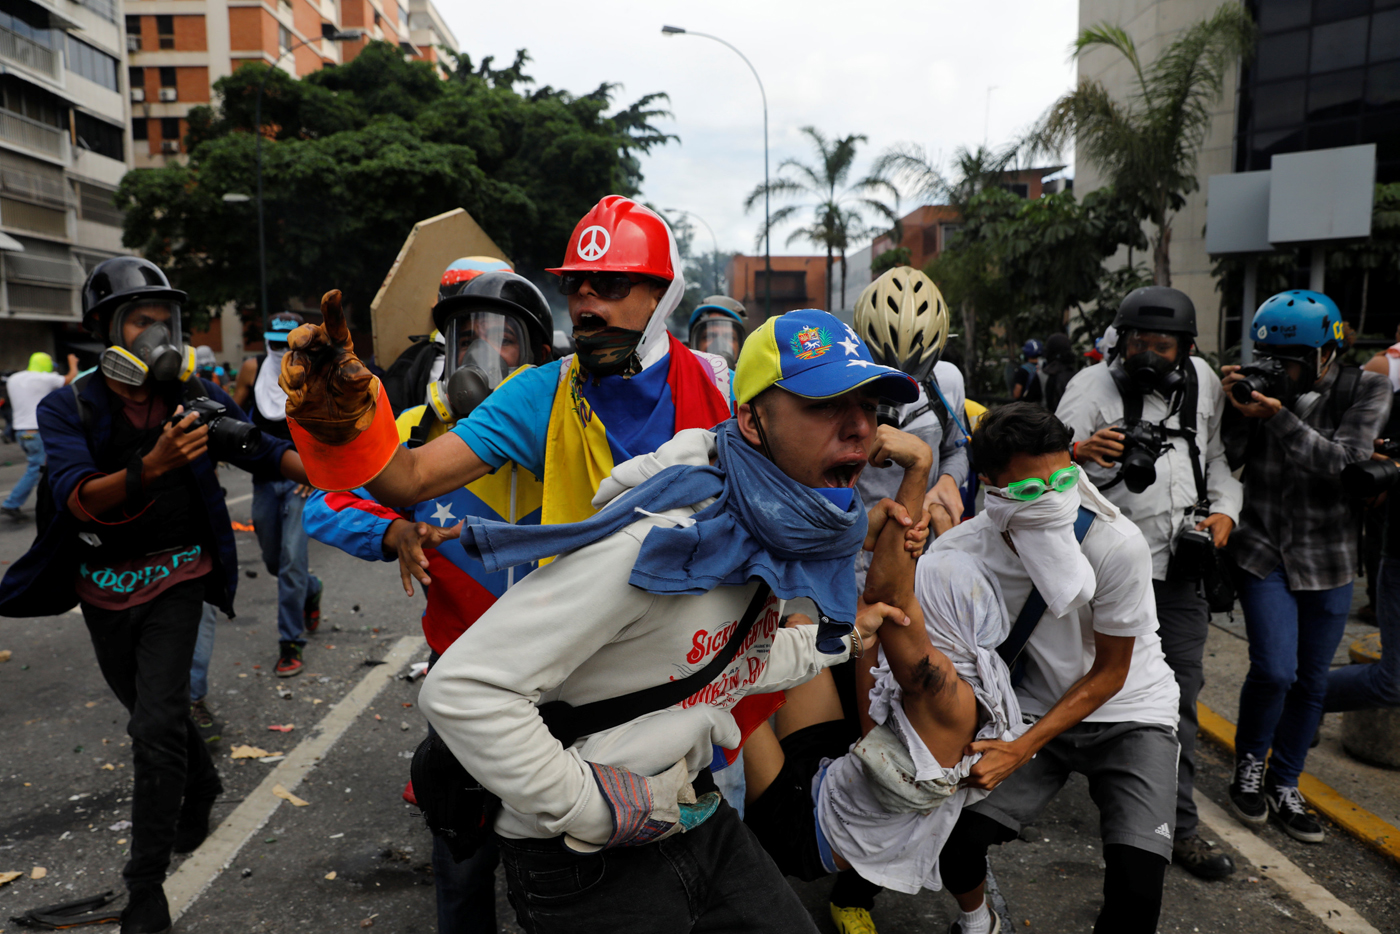 https://www.lapatilla.com/site/wp-content/uploads/2017/05/2017-05-03T210427Z_574630669_RC16B7048910_RTRMADP_3_VENEZUELA-POLITICS.jpg